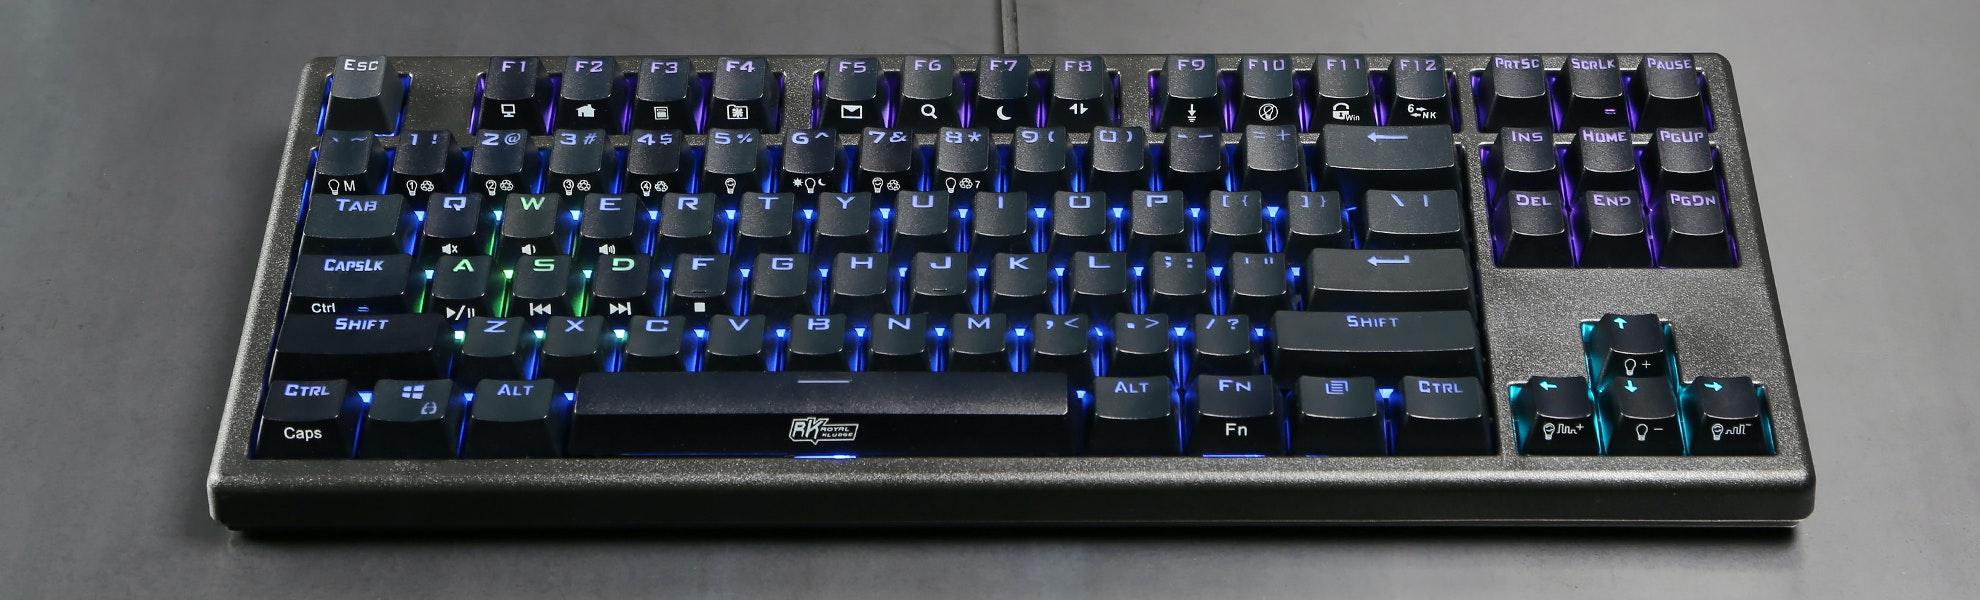 RC930 Electro Capacitive Keyboard (TKL/Full Size)